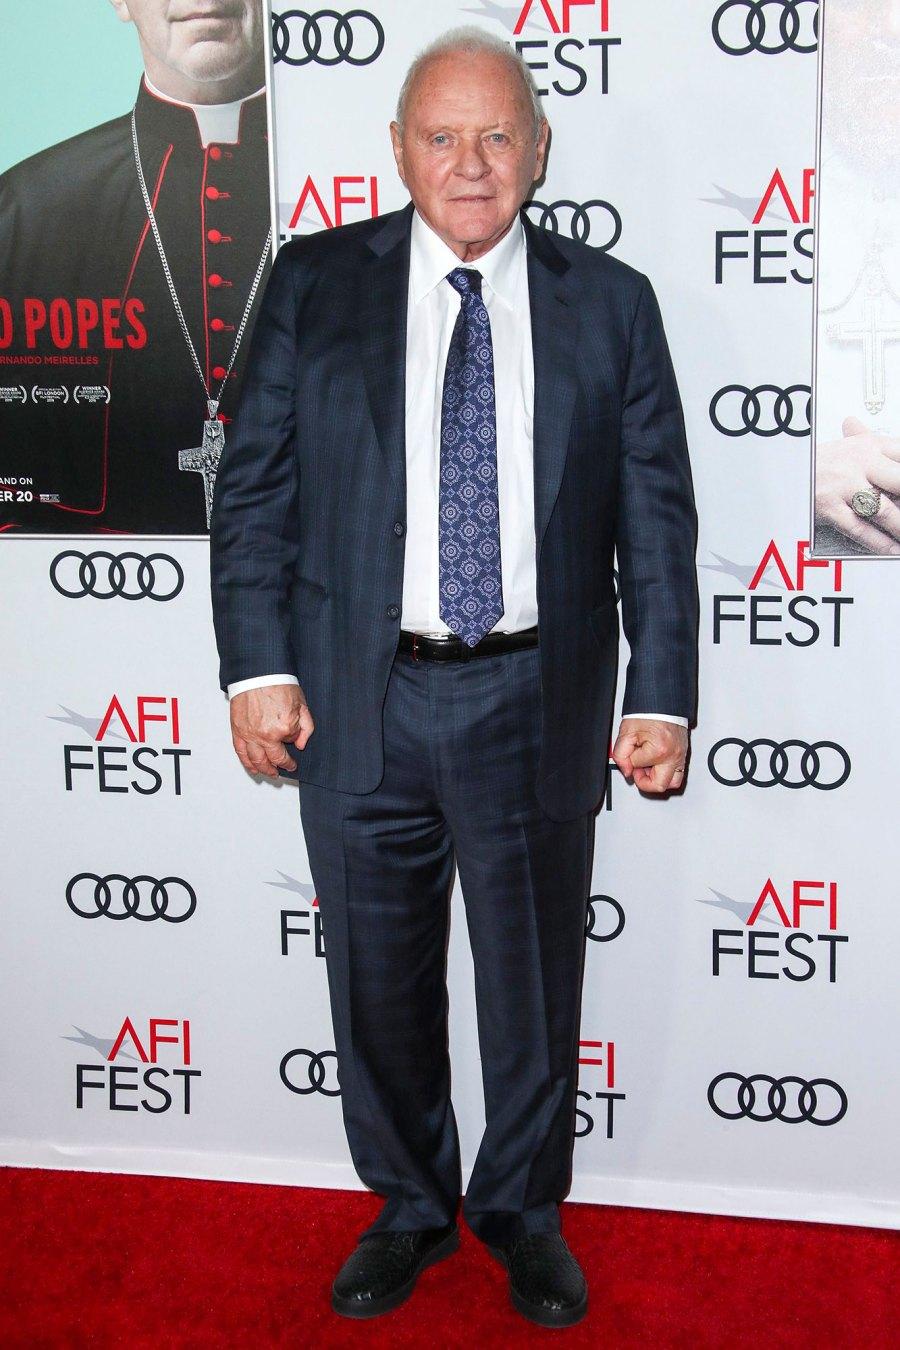 Anthony Hopkins Honors Chadwick Boseman in Delayed Oscars Speech 2